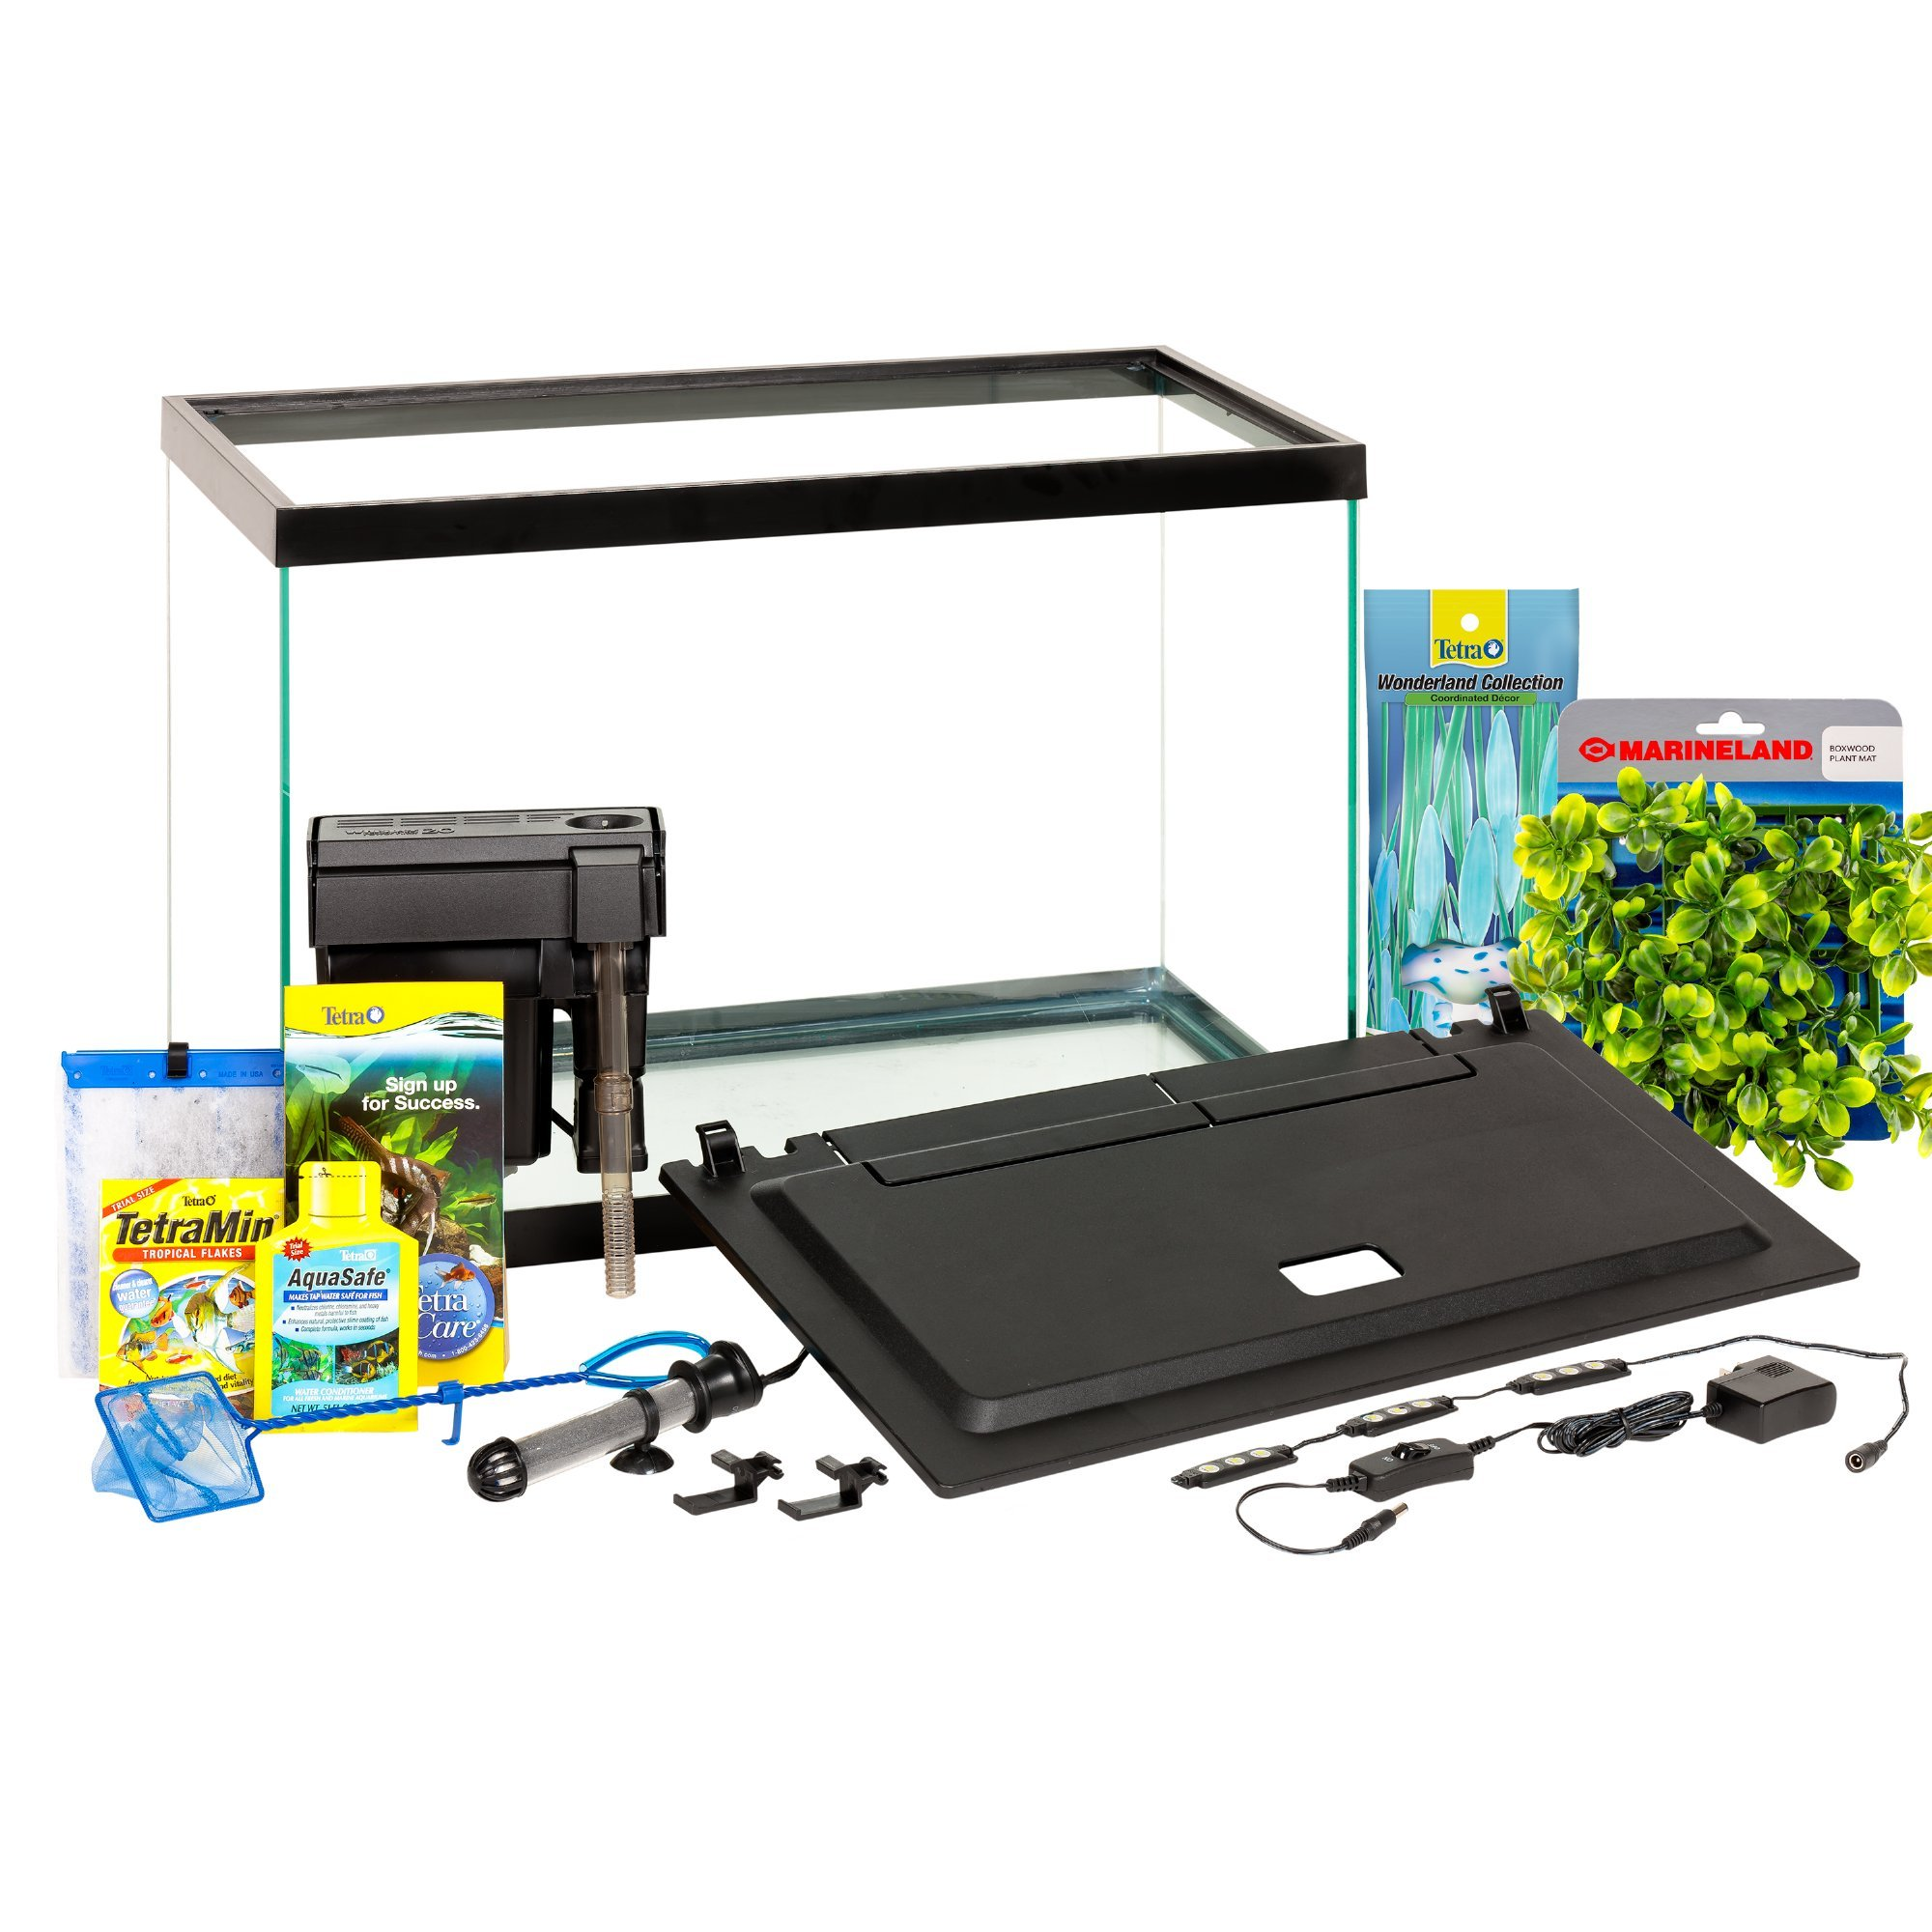 Tetra Aquarium 20 Gallon Fish Tank Kit, Includes LED Lighting and Decor by Tetra